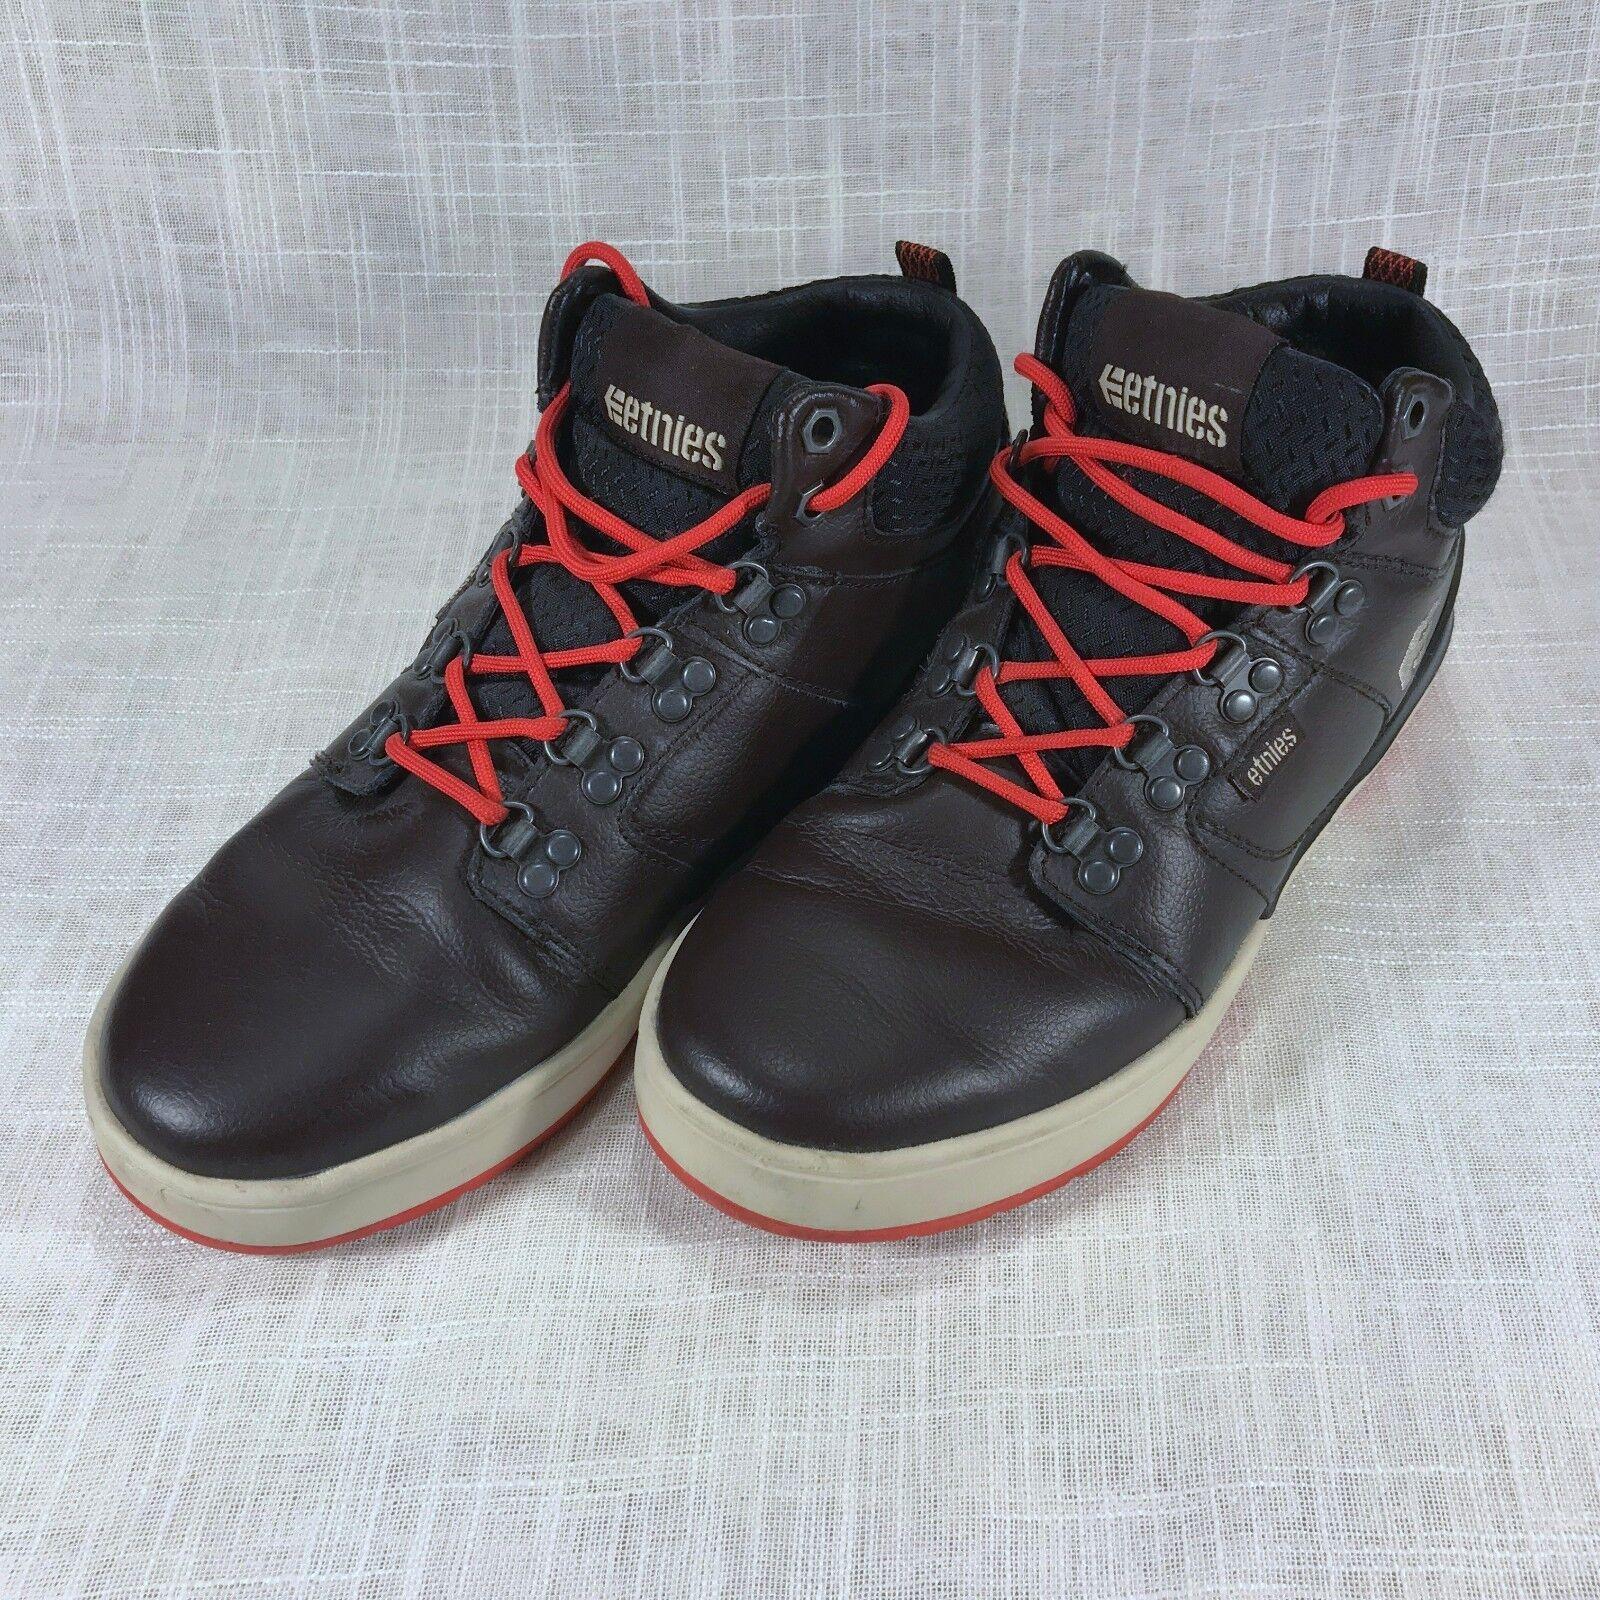 new product d212e 273cf Etnies High Rise ODB LX LX LX Skate Shoe   Sneaker - Dark Brown - Size